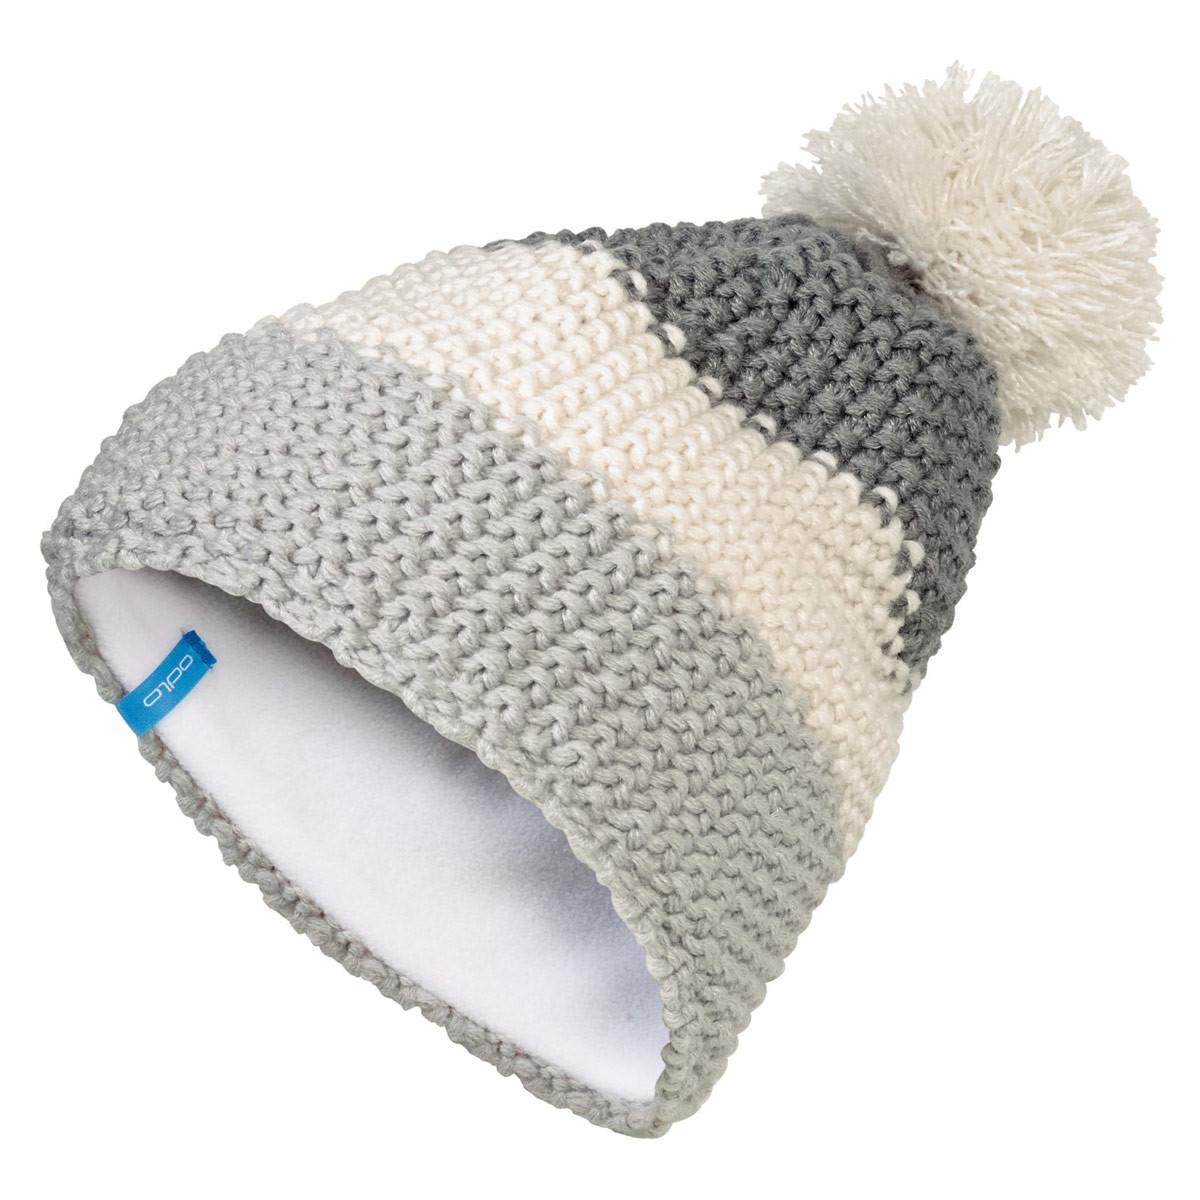 e84c6e7e2f2 Odlo Hat Chunky Knit - Beanies - Grey